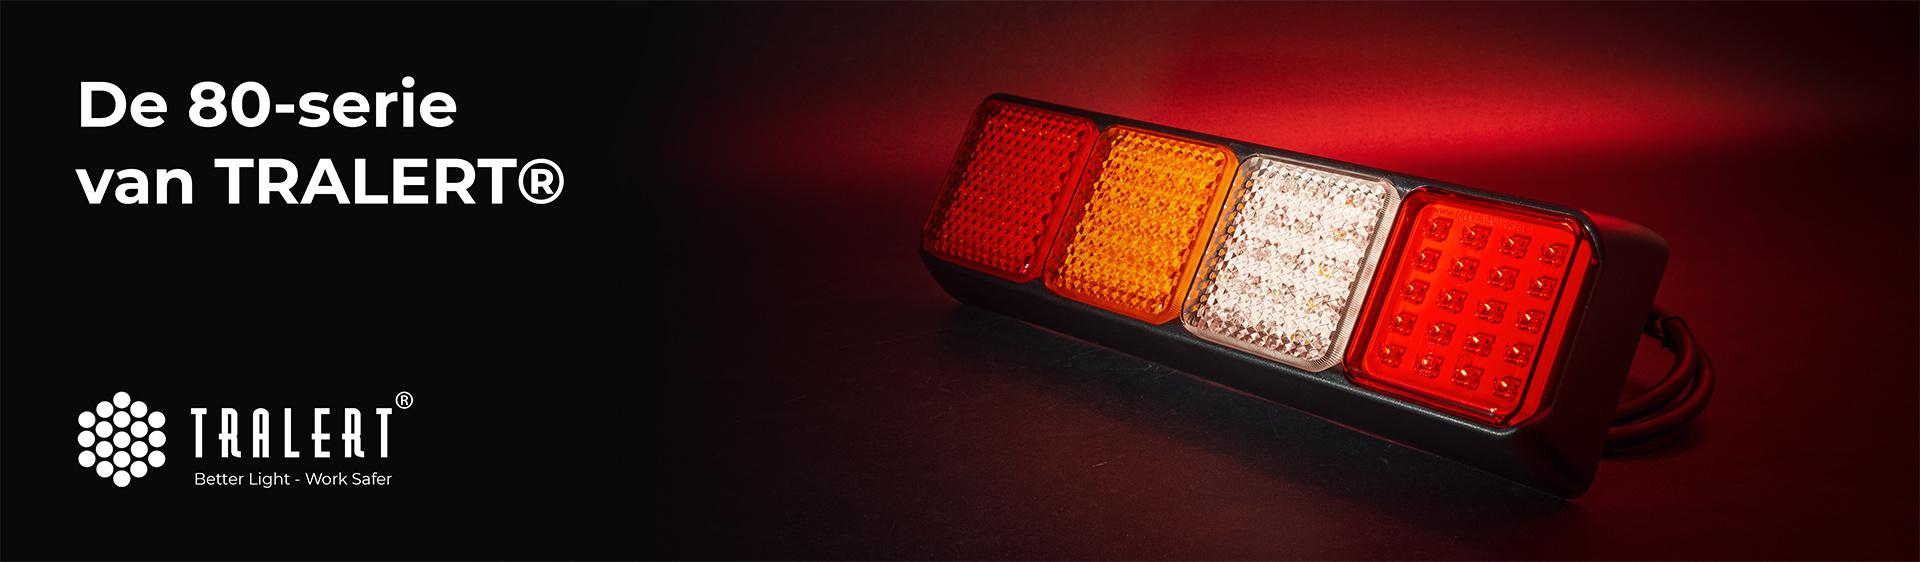 Tralert 80 serie LED achterlicht